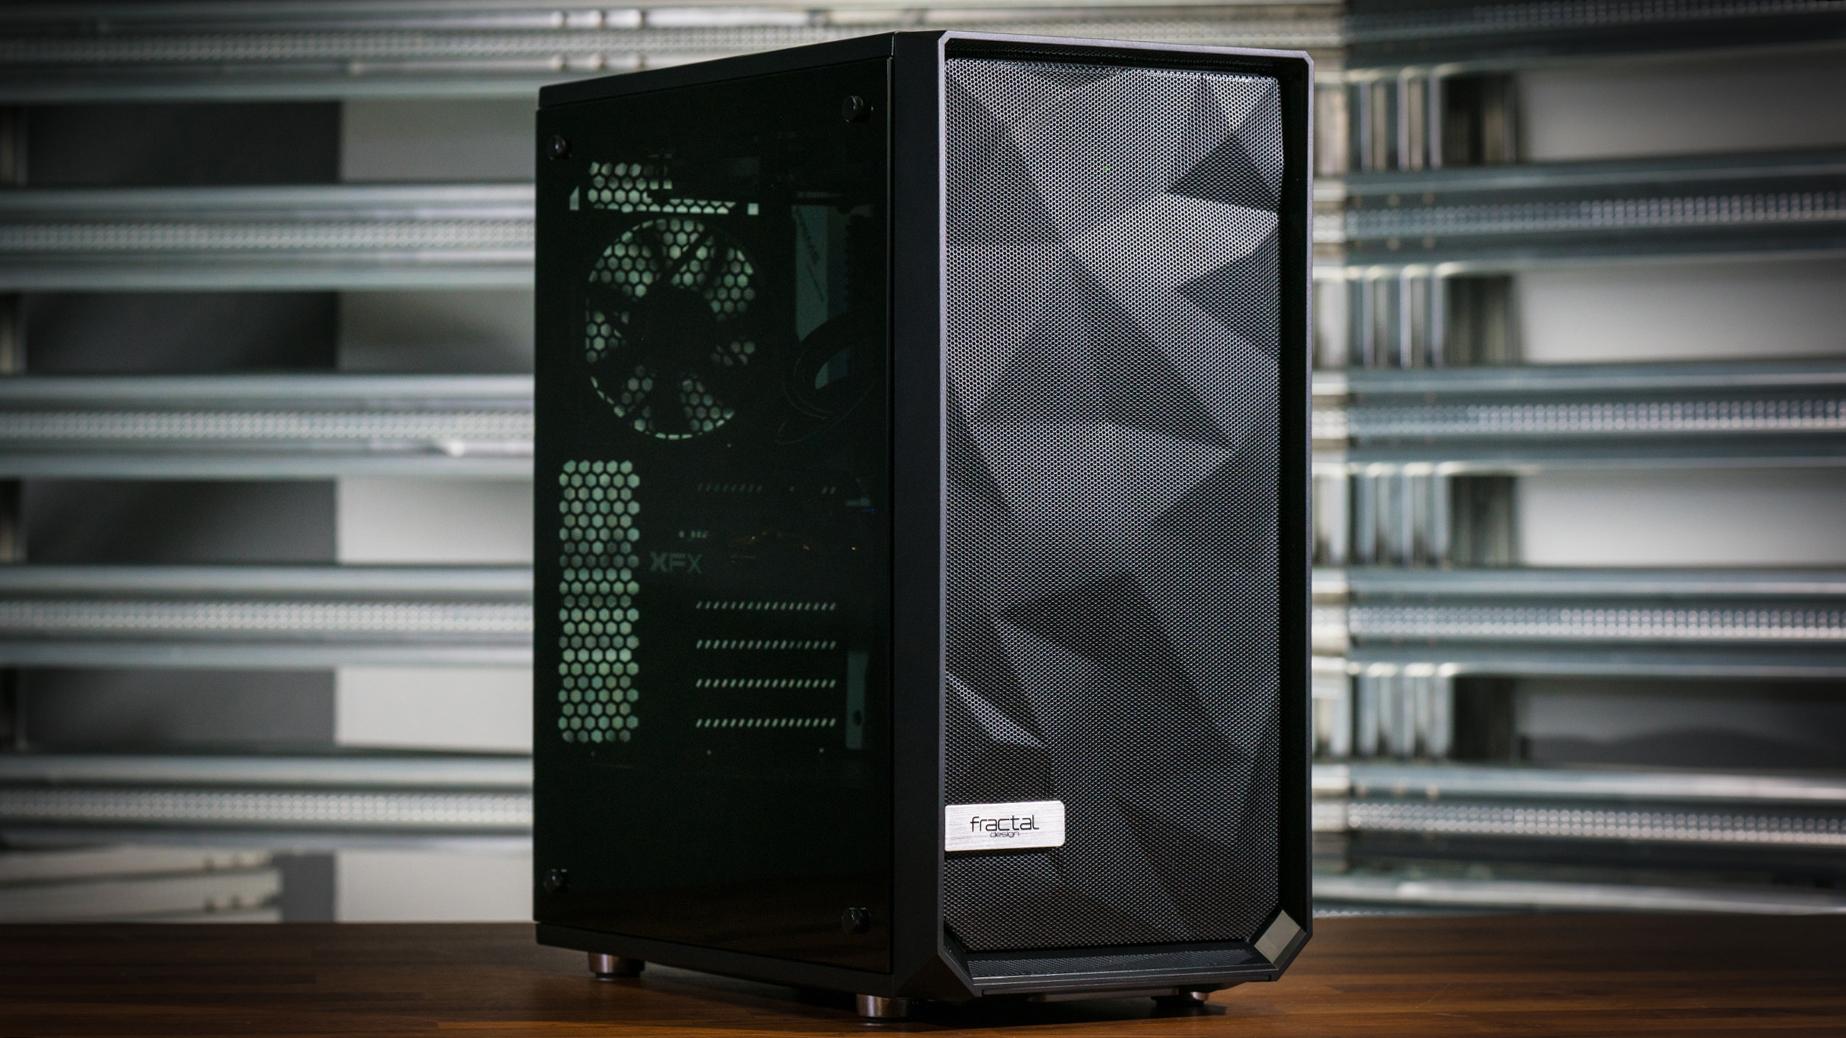 Newegg pc build kits cooler master h500p mid tower case image description solutioingenieria Choice Image